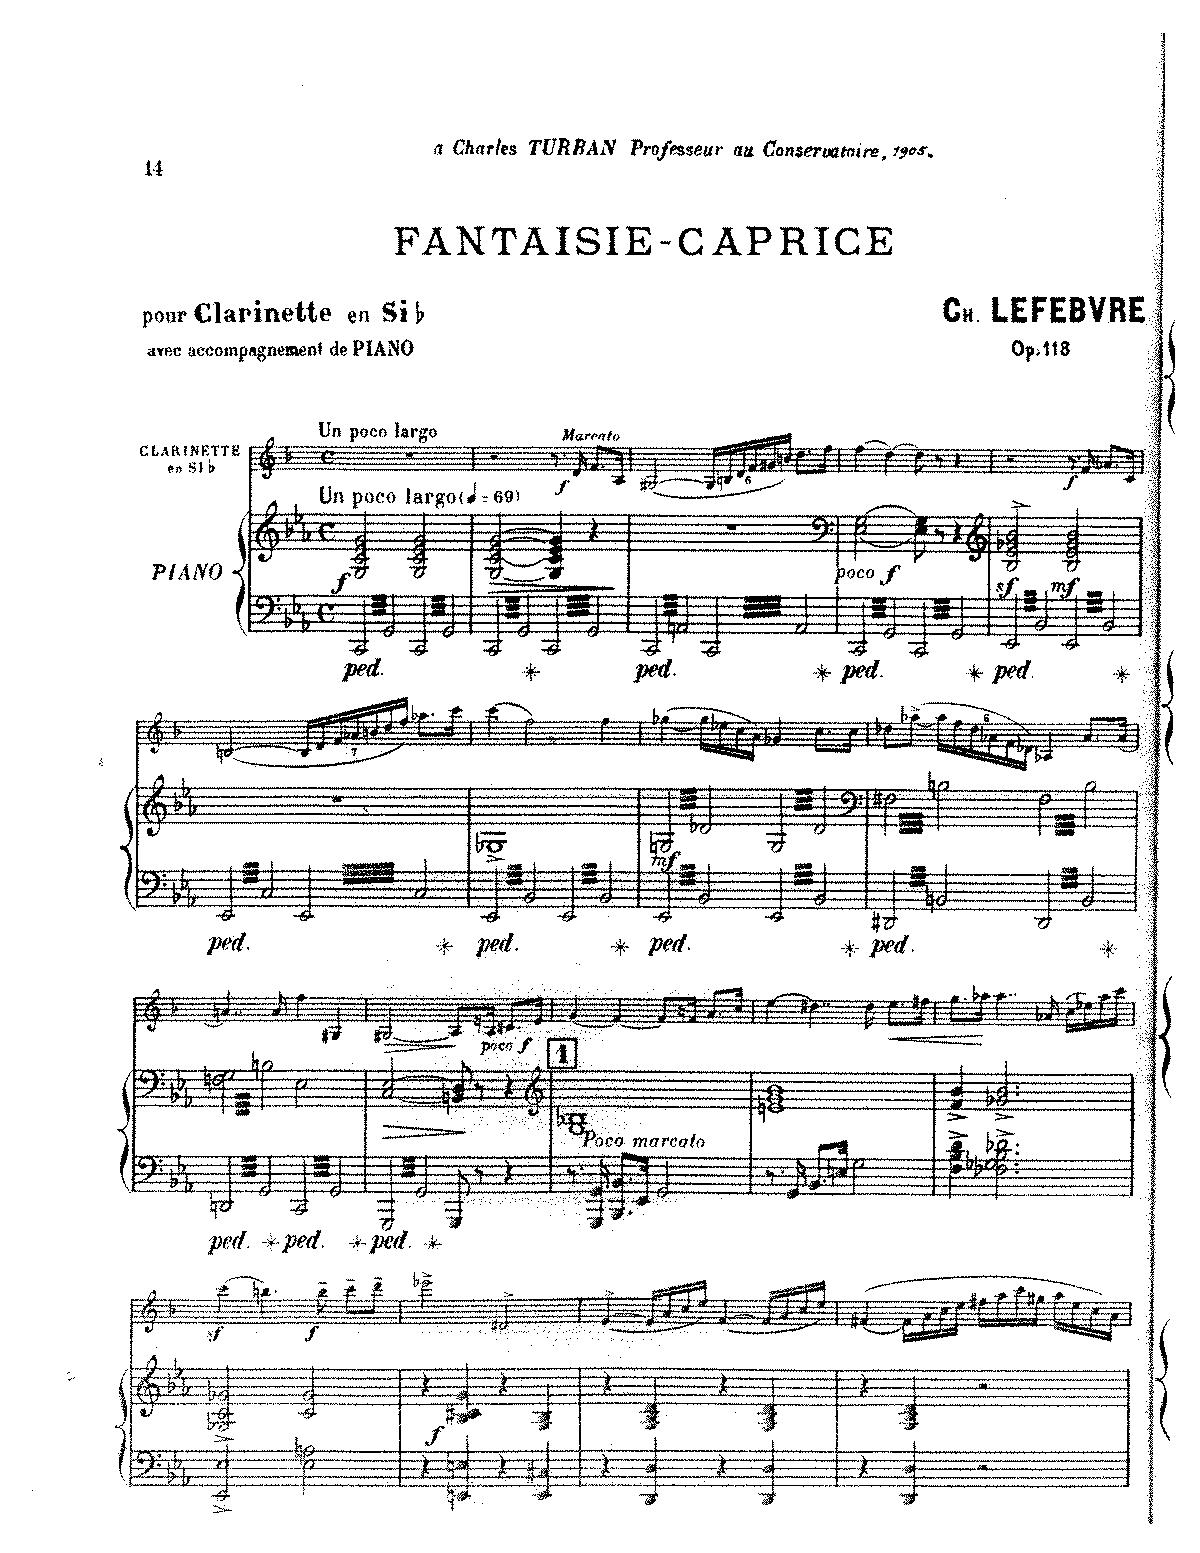 BOZZA CAPRICE PDF